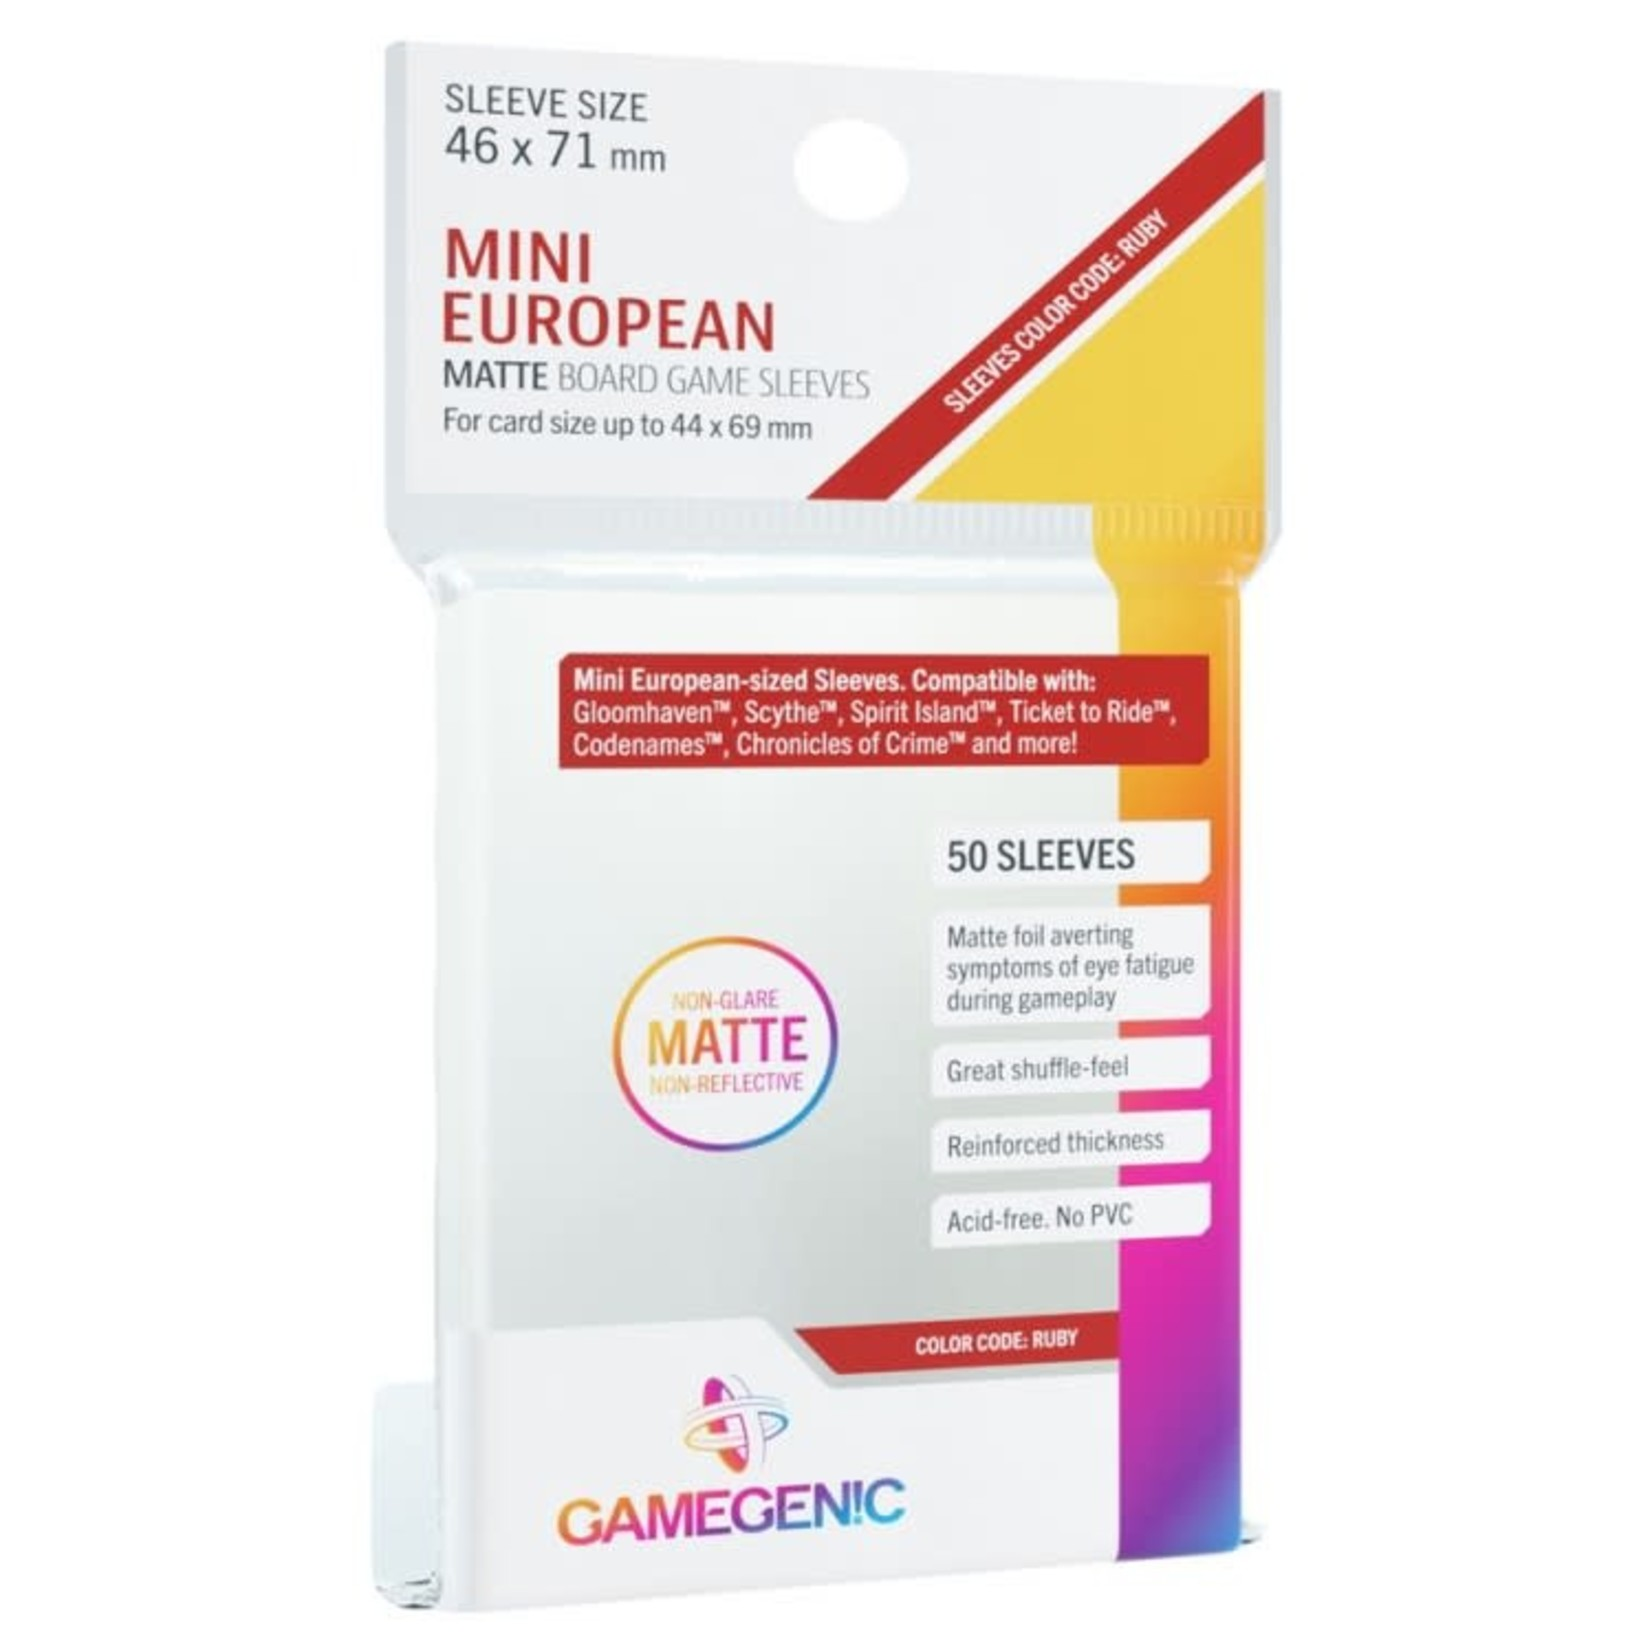 Gamegenic Gamegenic Sleeves: Mini European MATTE - 50 count (46x71mm)